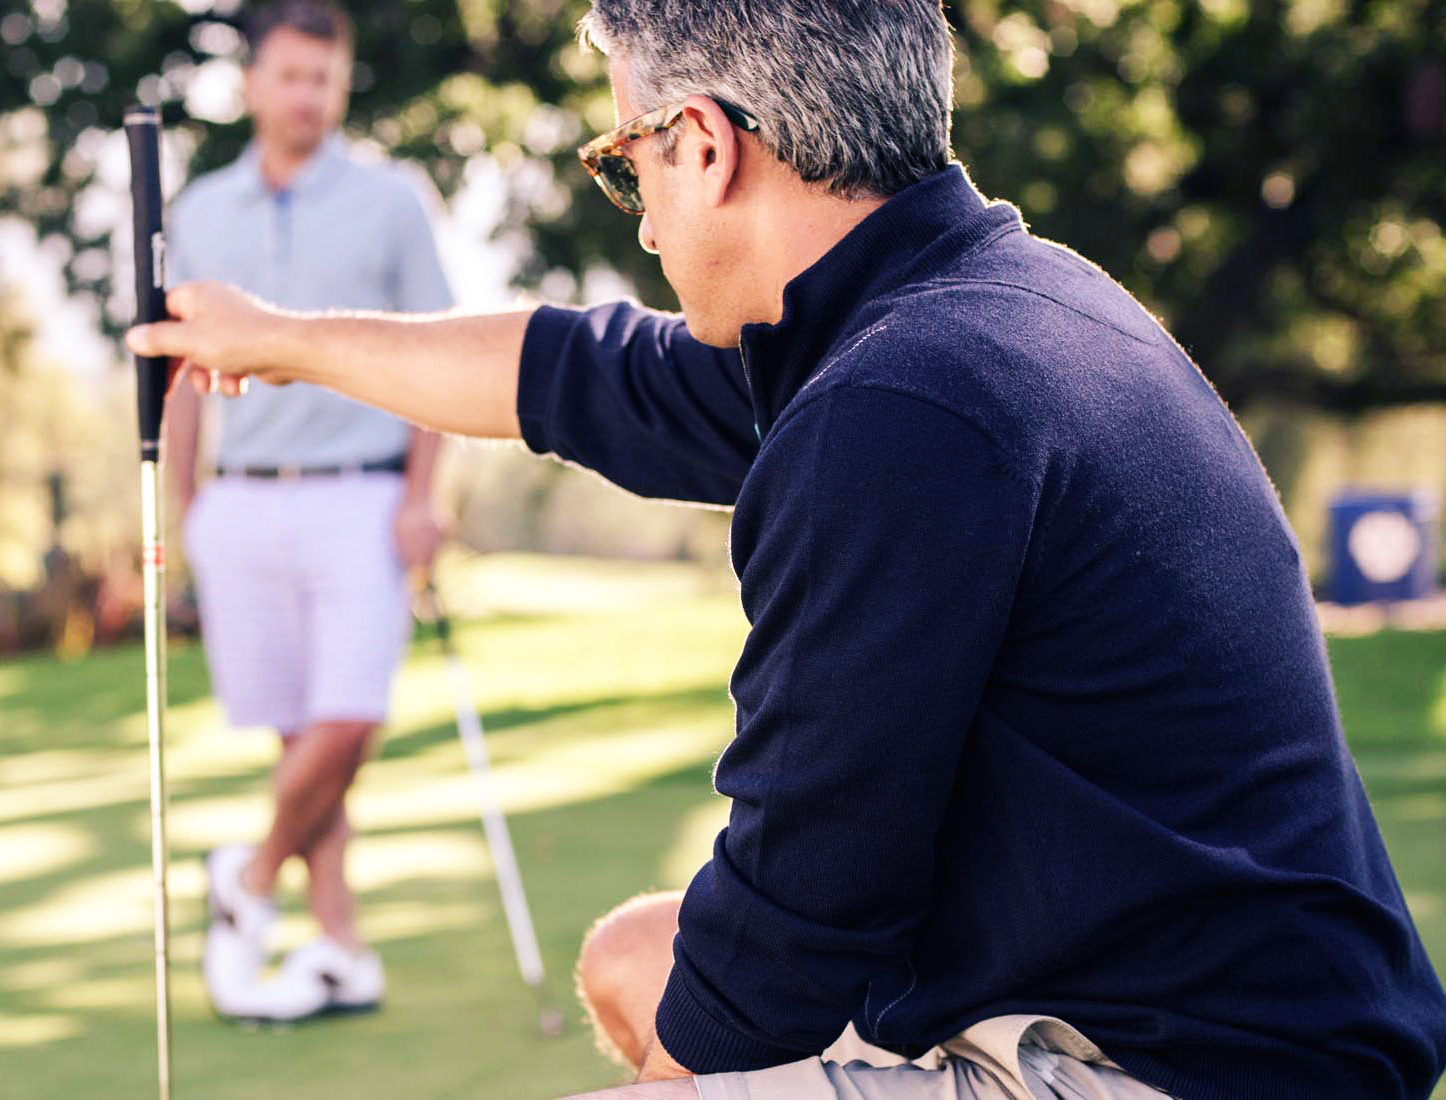 resort-over-golf-academy copy.jpg